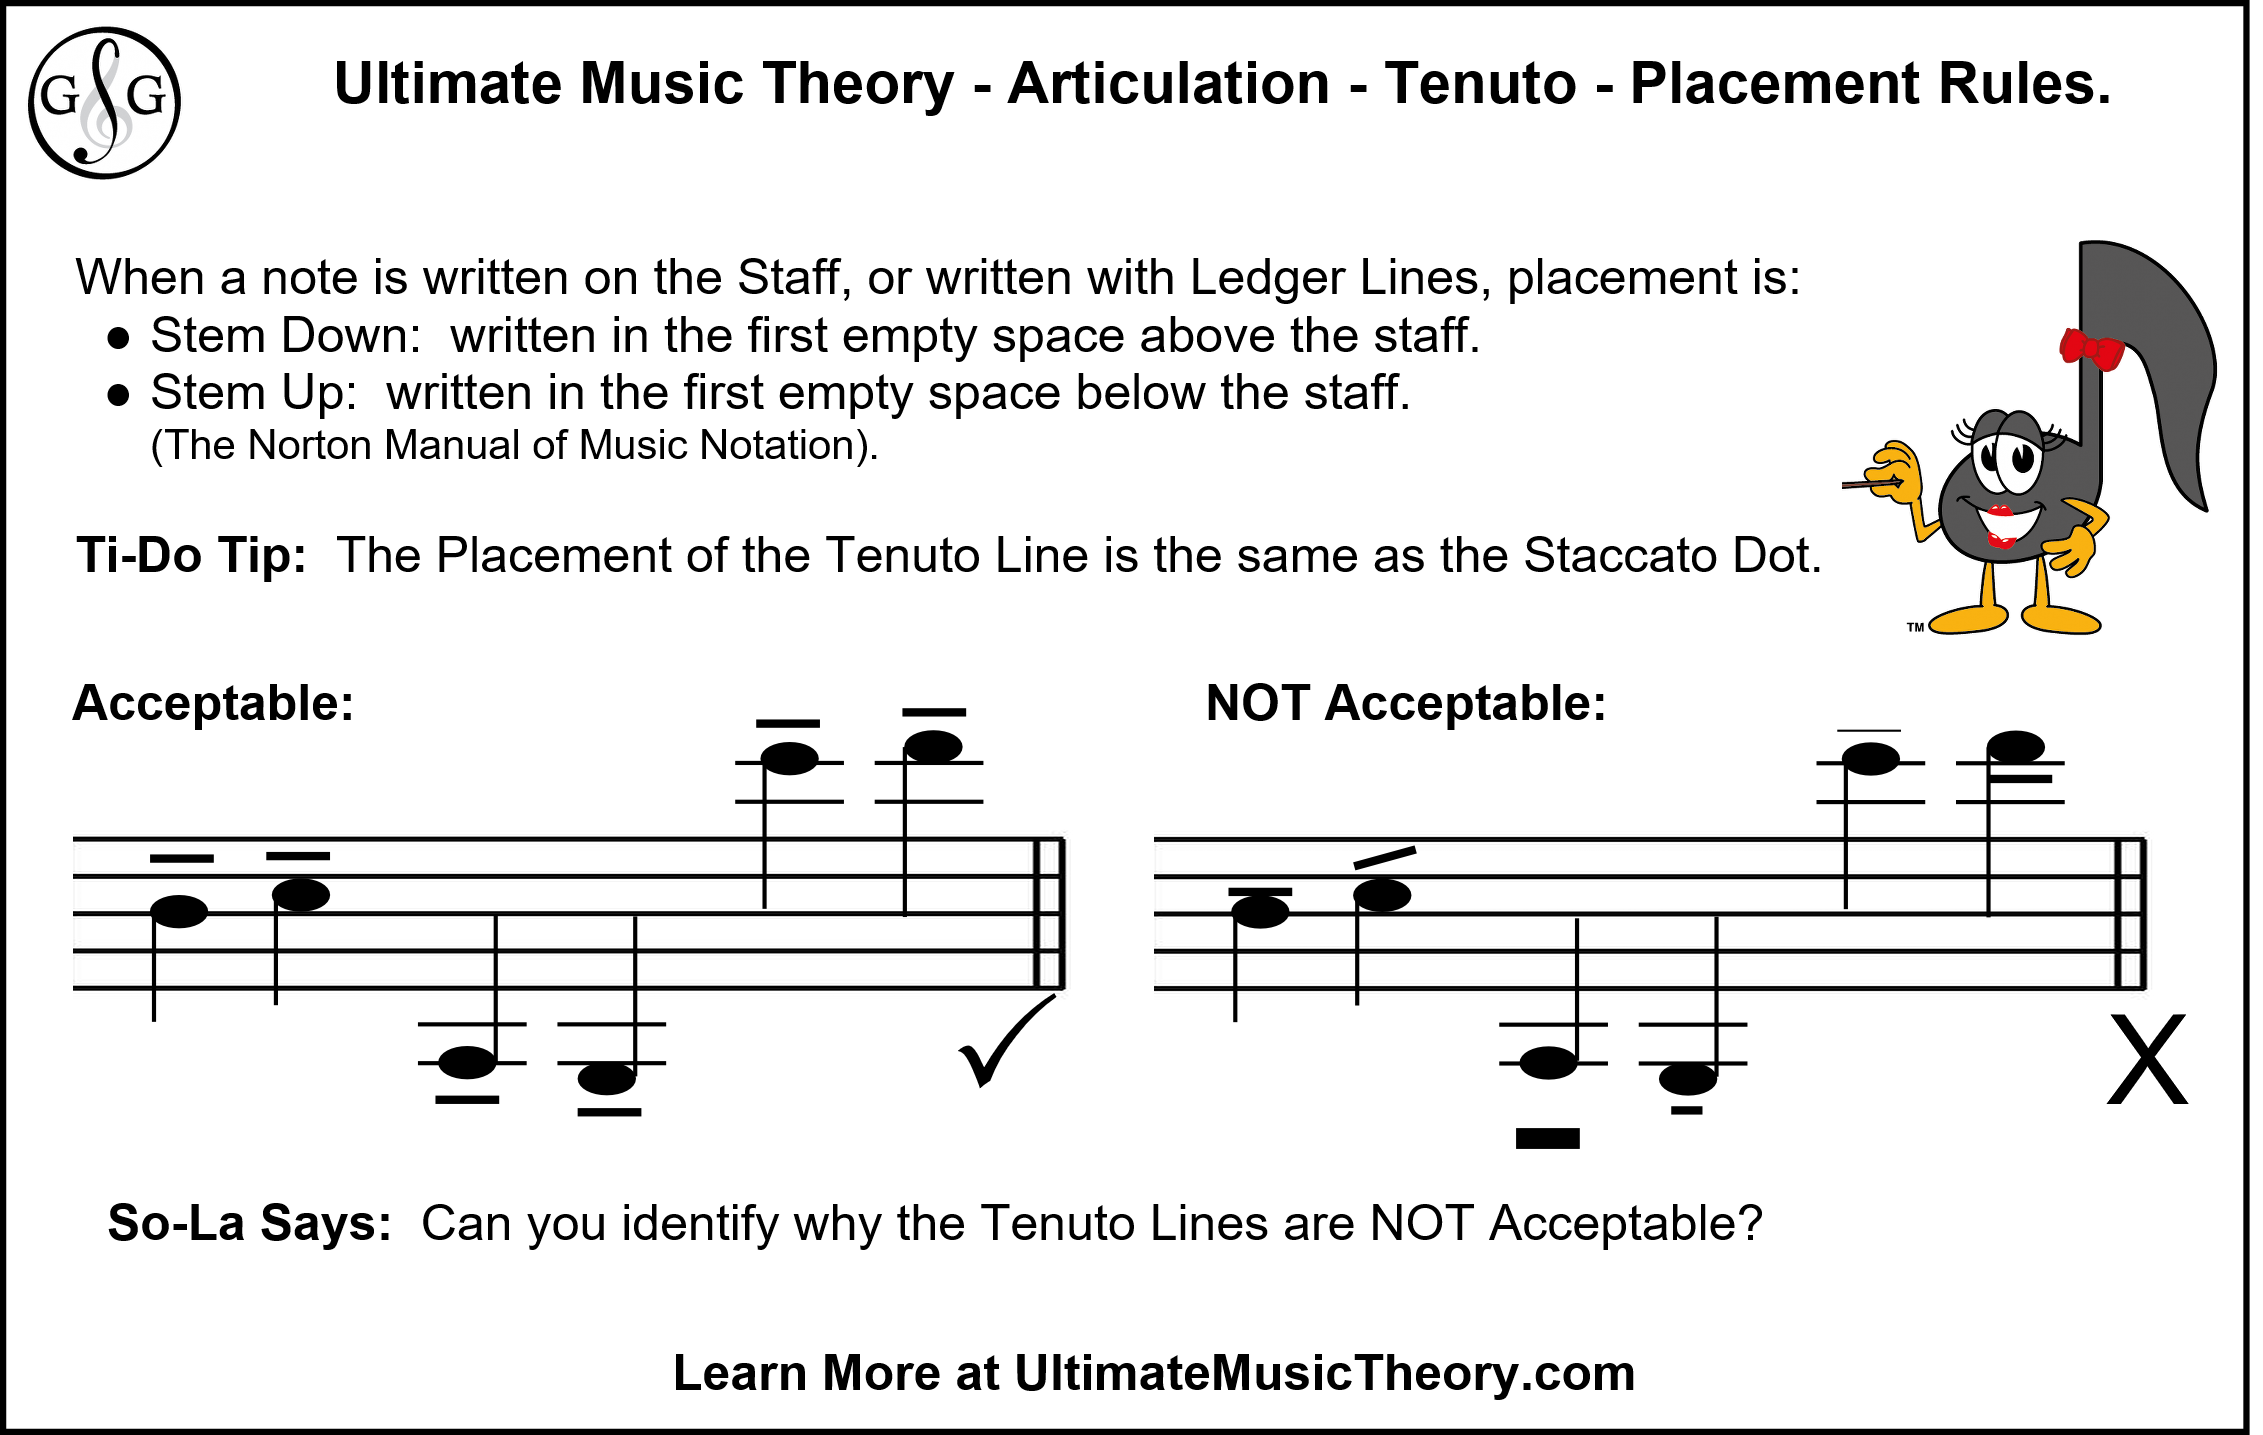 Articulation - Tenuto Line Placement